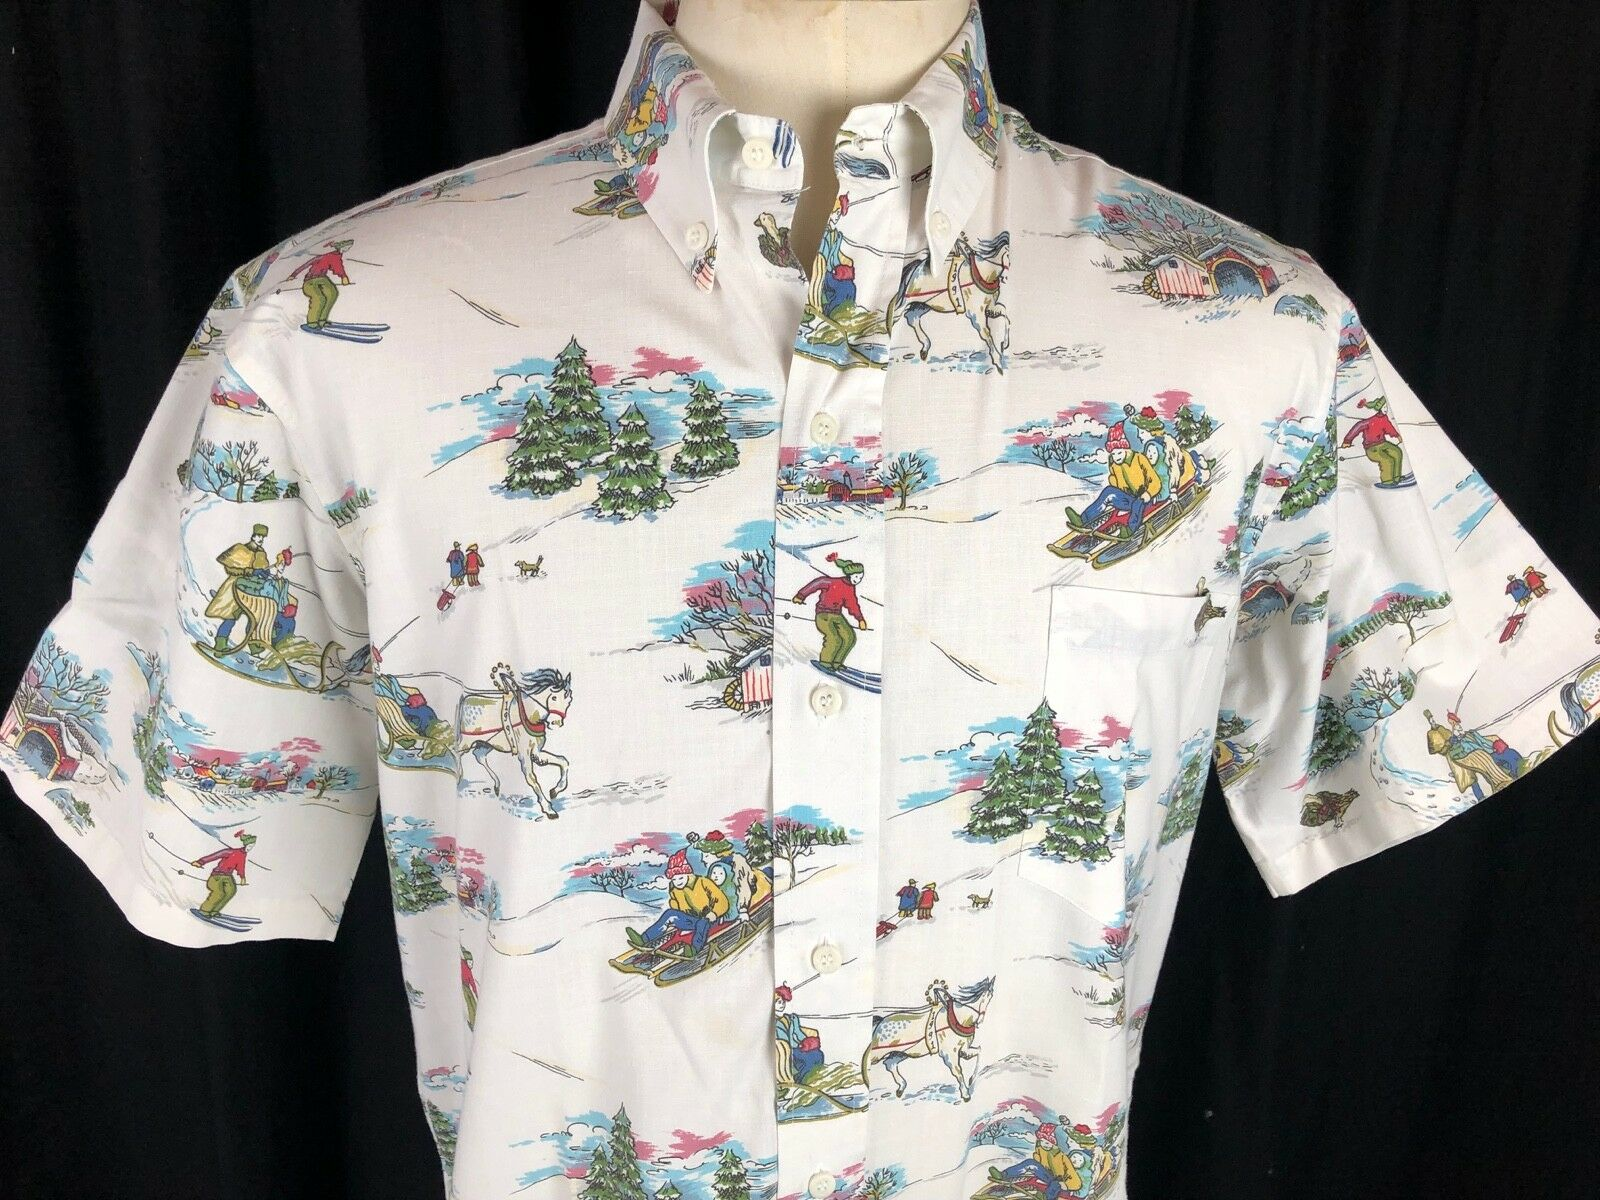 REYN SPOONER Vintage 1991 New England Snow Sledding White Christmas Shirt Sz L